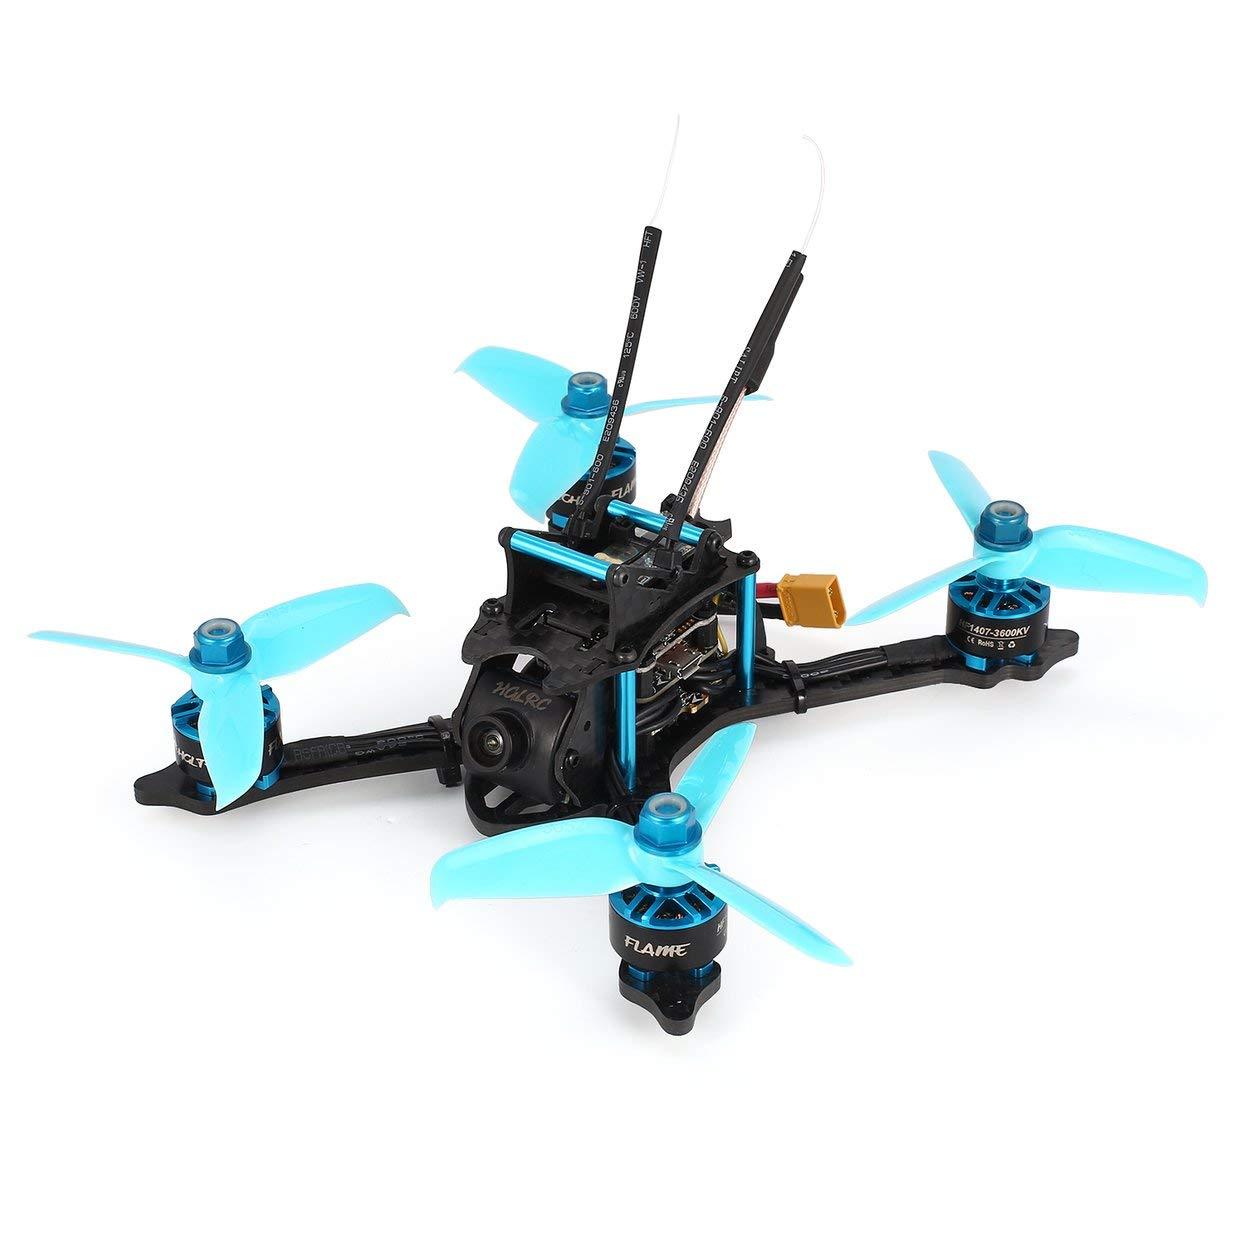 Für HGLRC XJB-145MM FPV Racing Drone mit OSD Omnibus F4 28A 2-4S Blheli_S ESC 25/100/200 / 350mW Umschaltbar VTX BNF Version